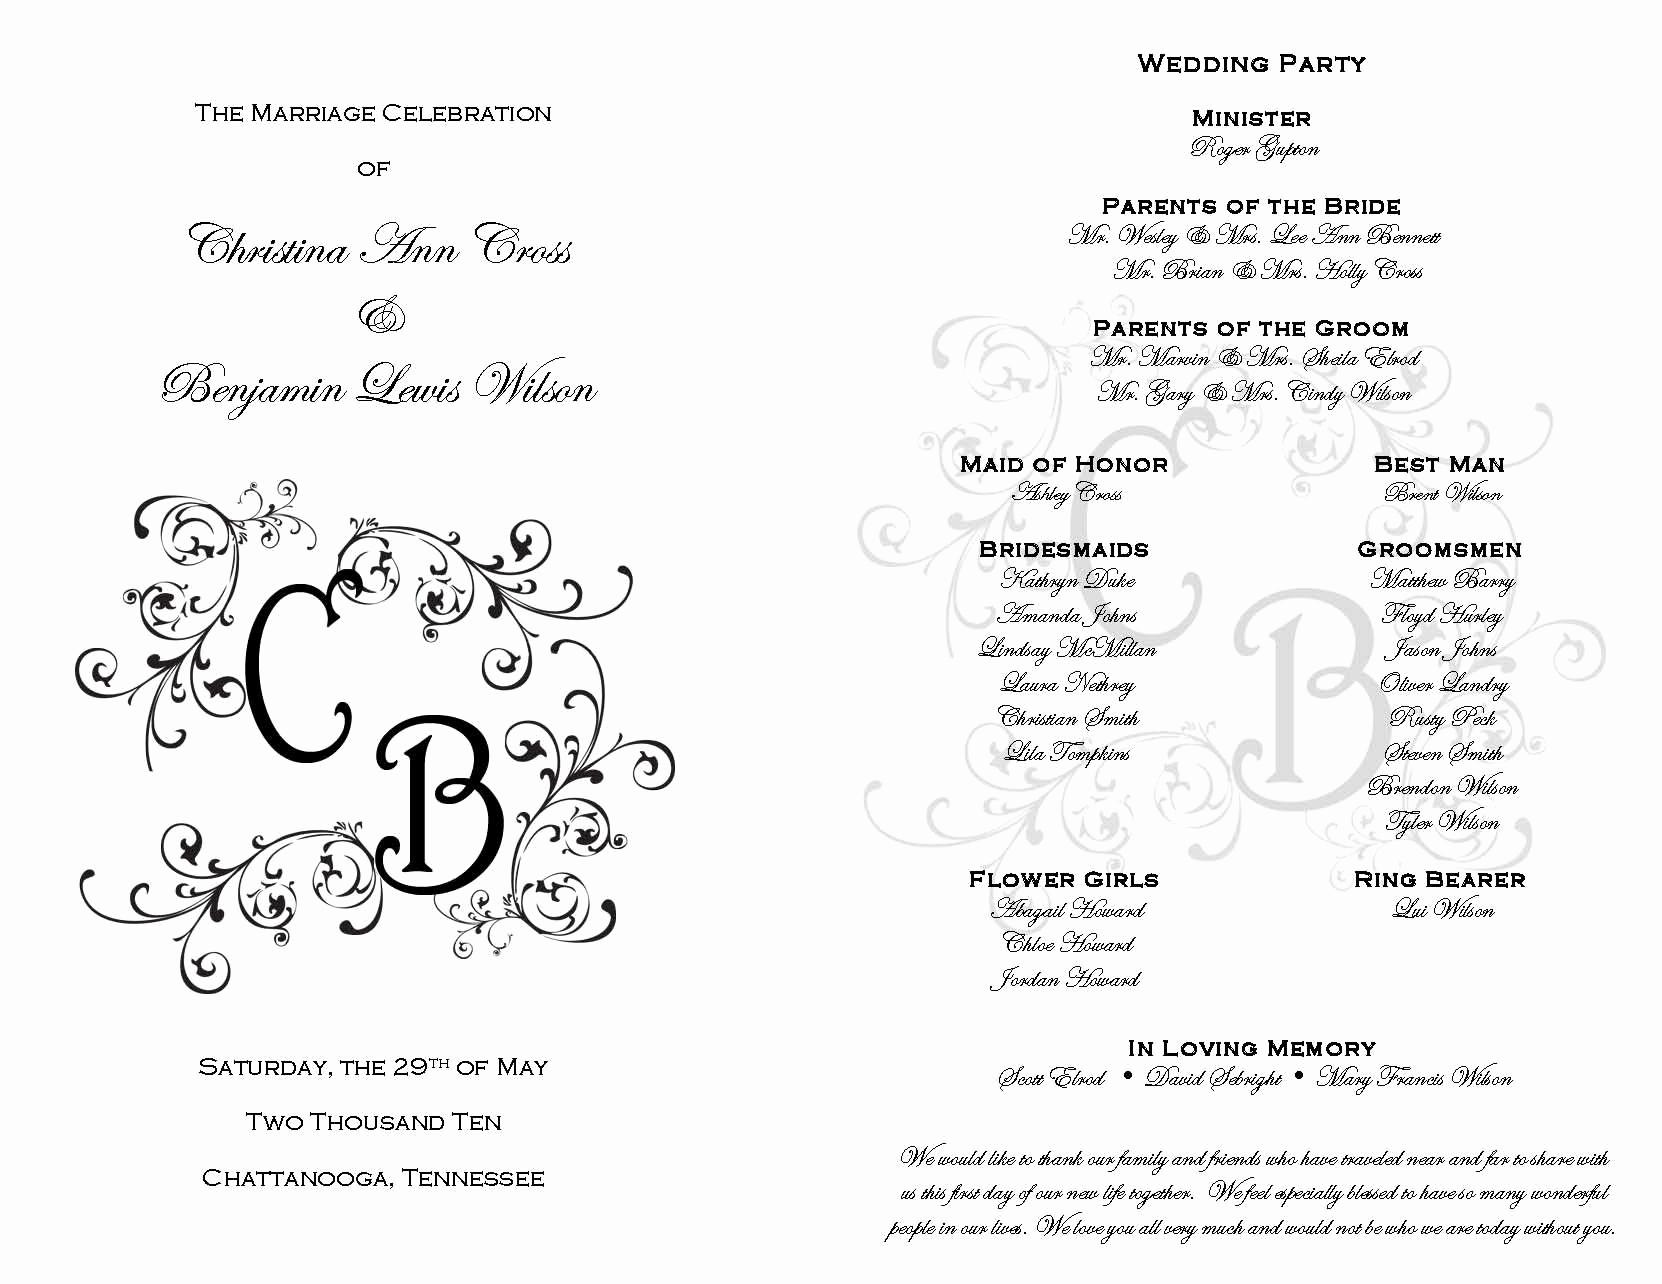 Free Printable Wedding Program Templates Lovely Printable Wedding Programs On Pinterest